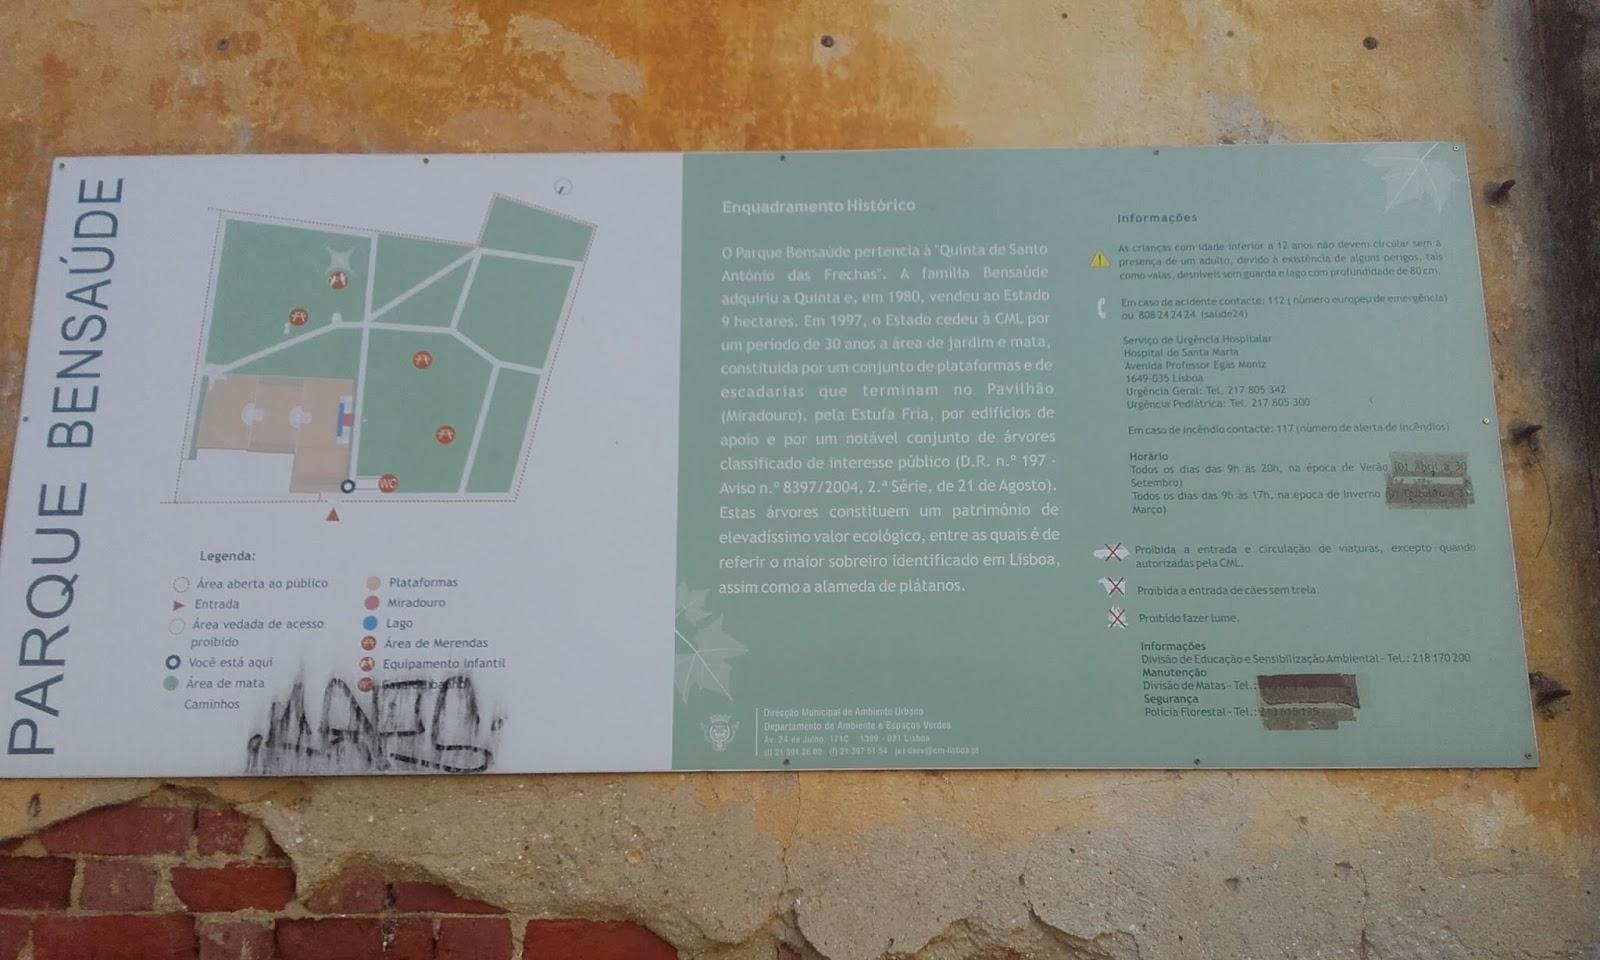 Parque BemSaude Info